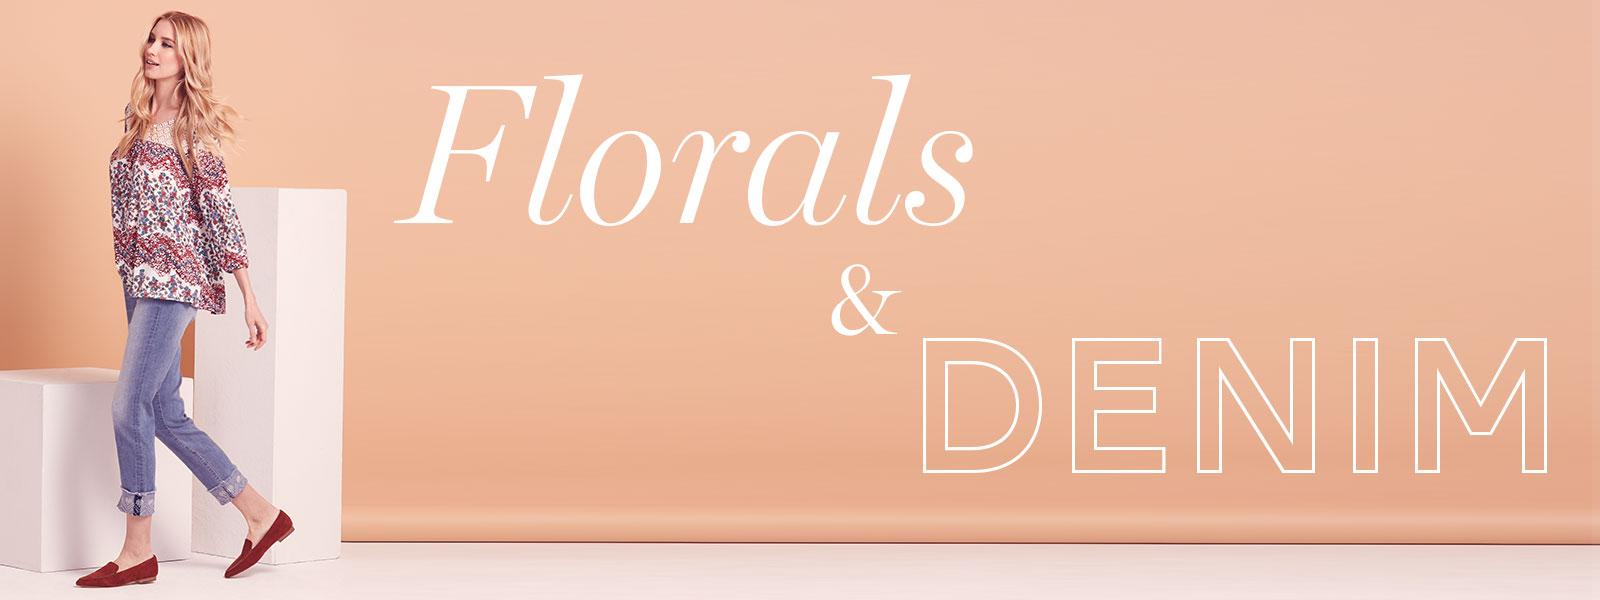 Floral & Denims